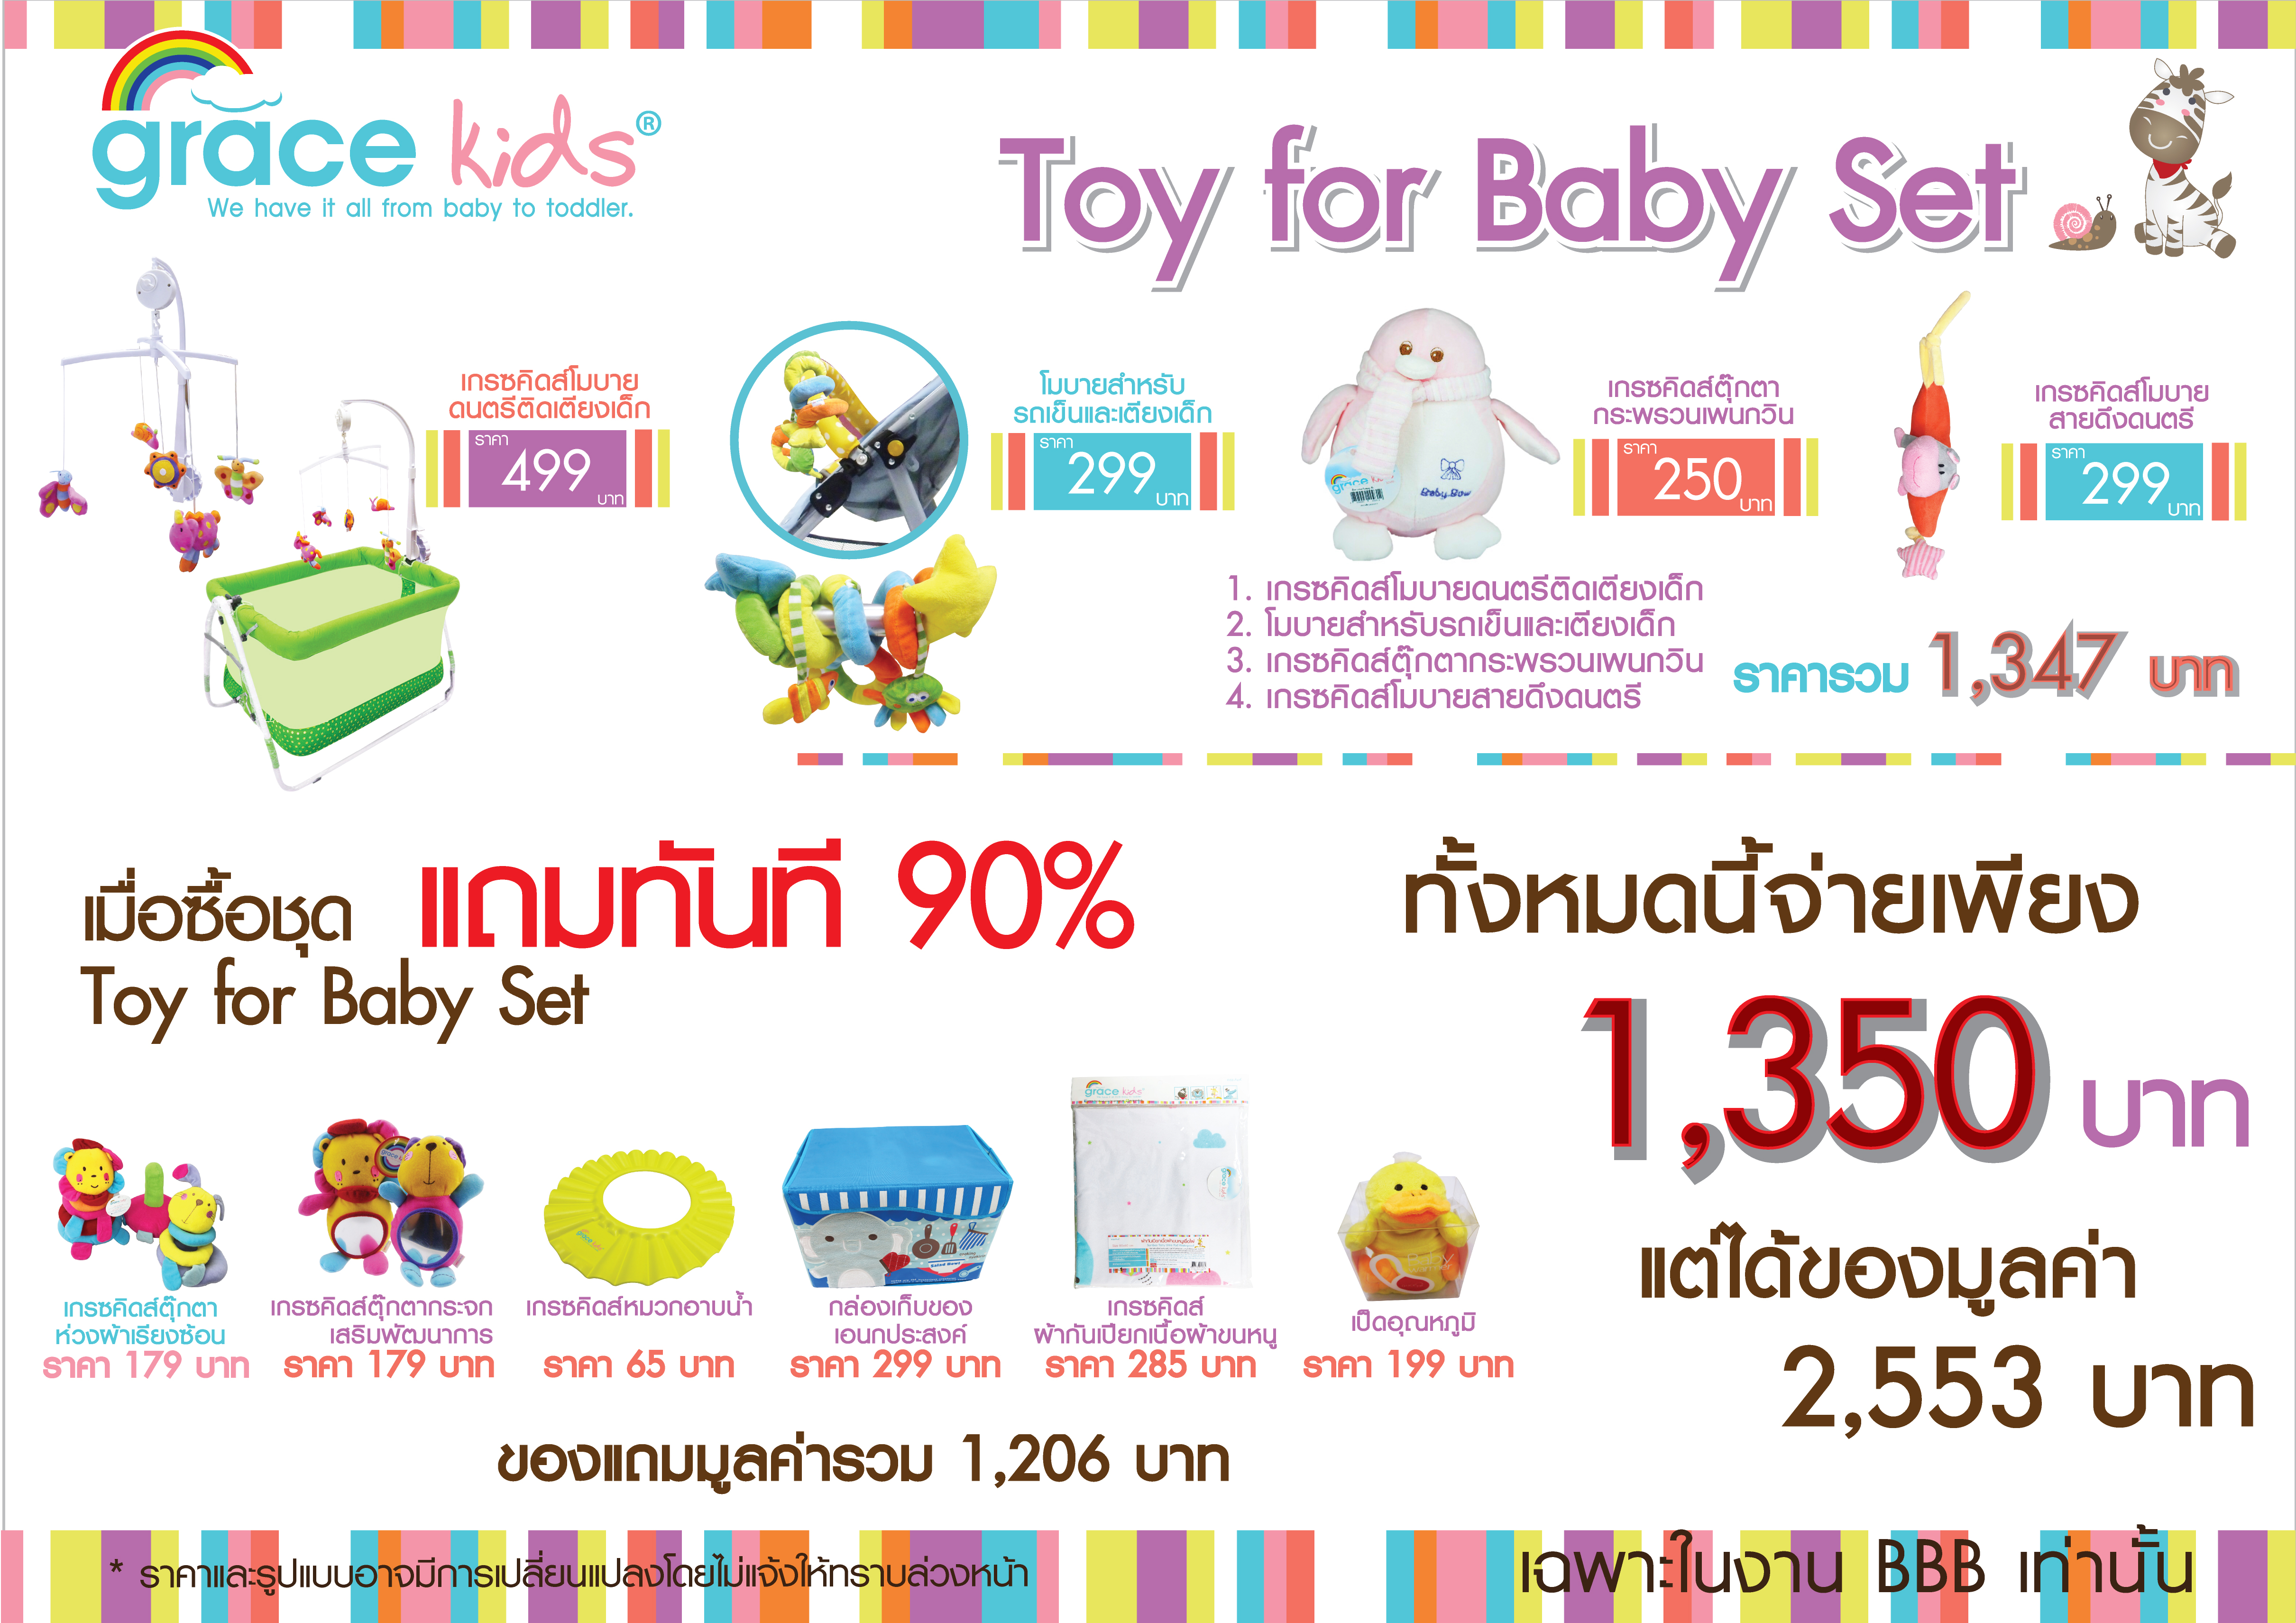 Toy for Baby Set (10 รายการ)